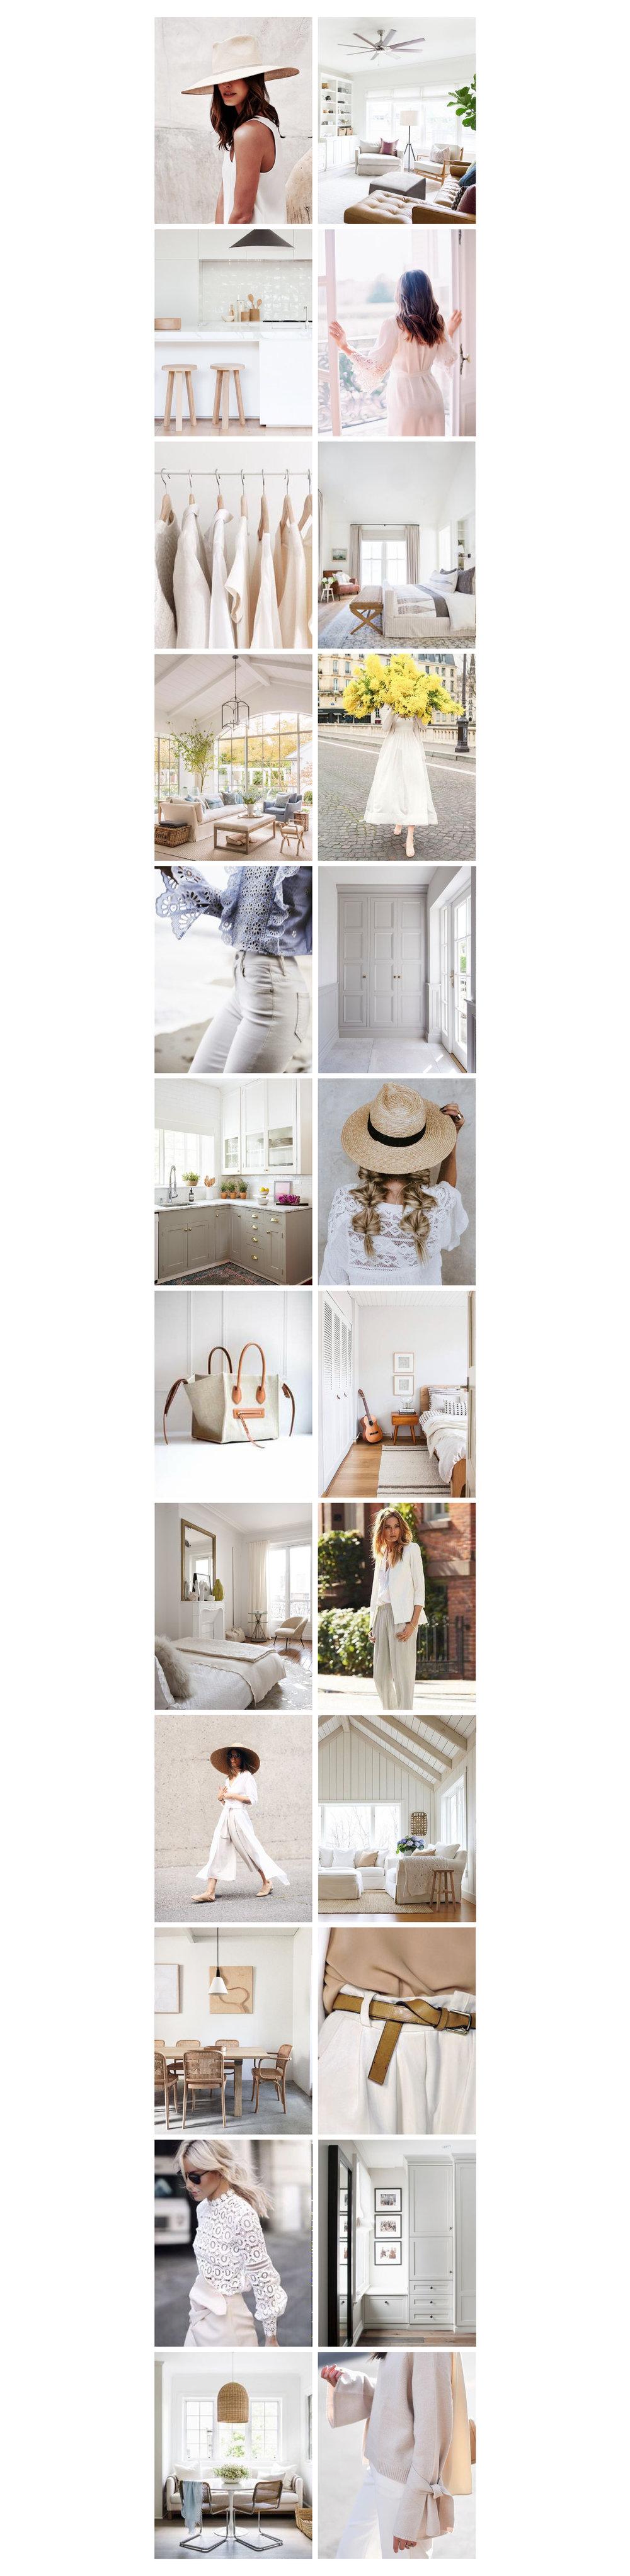 kris and kate studio_fashion vs interior trends_white